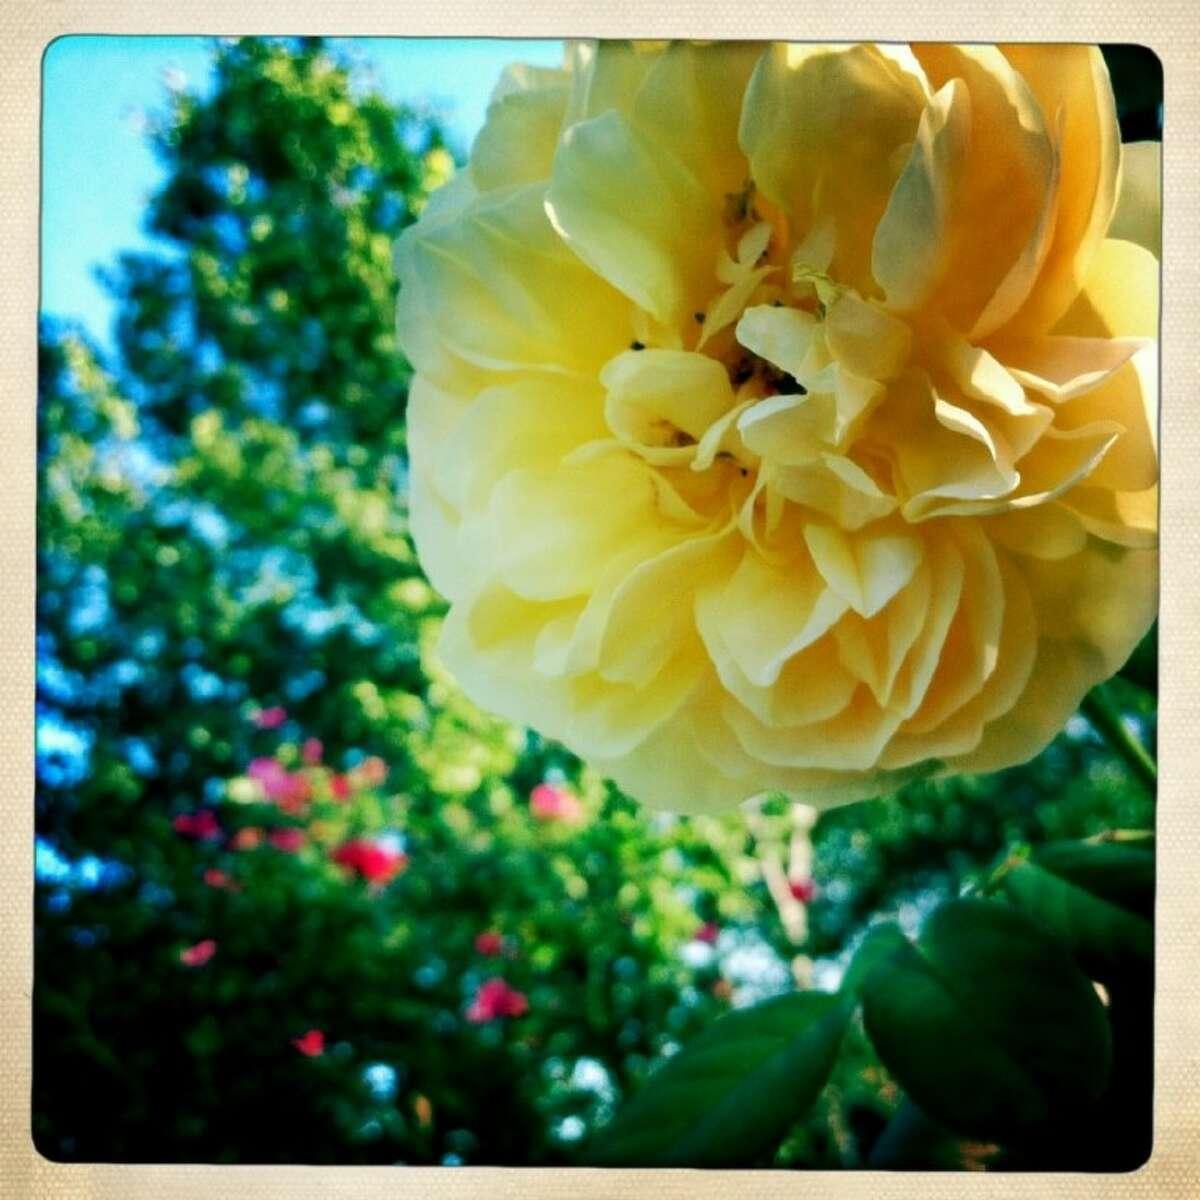 A Graham Thomas rose bloom.